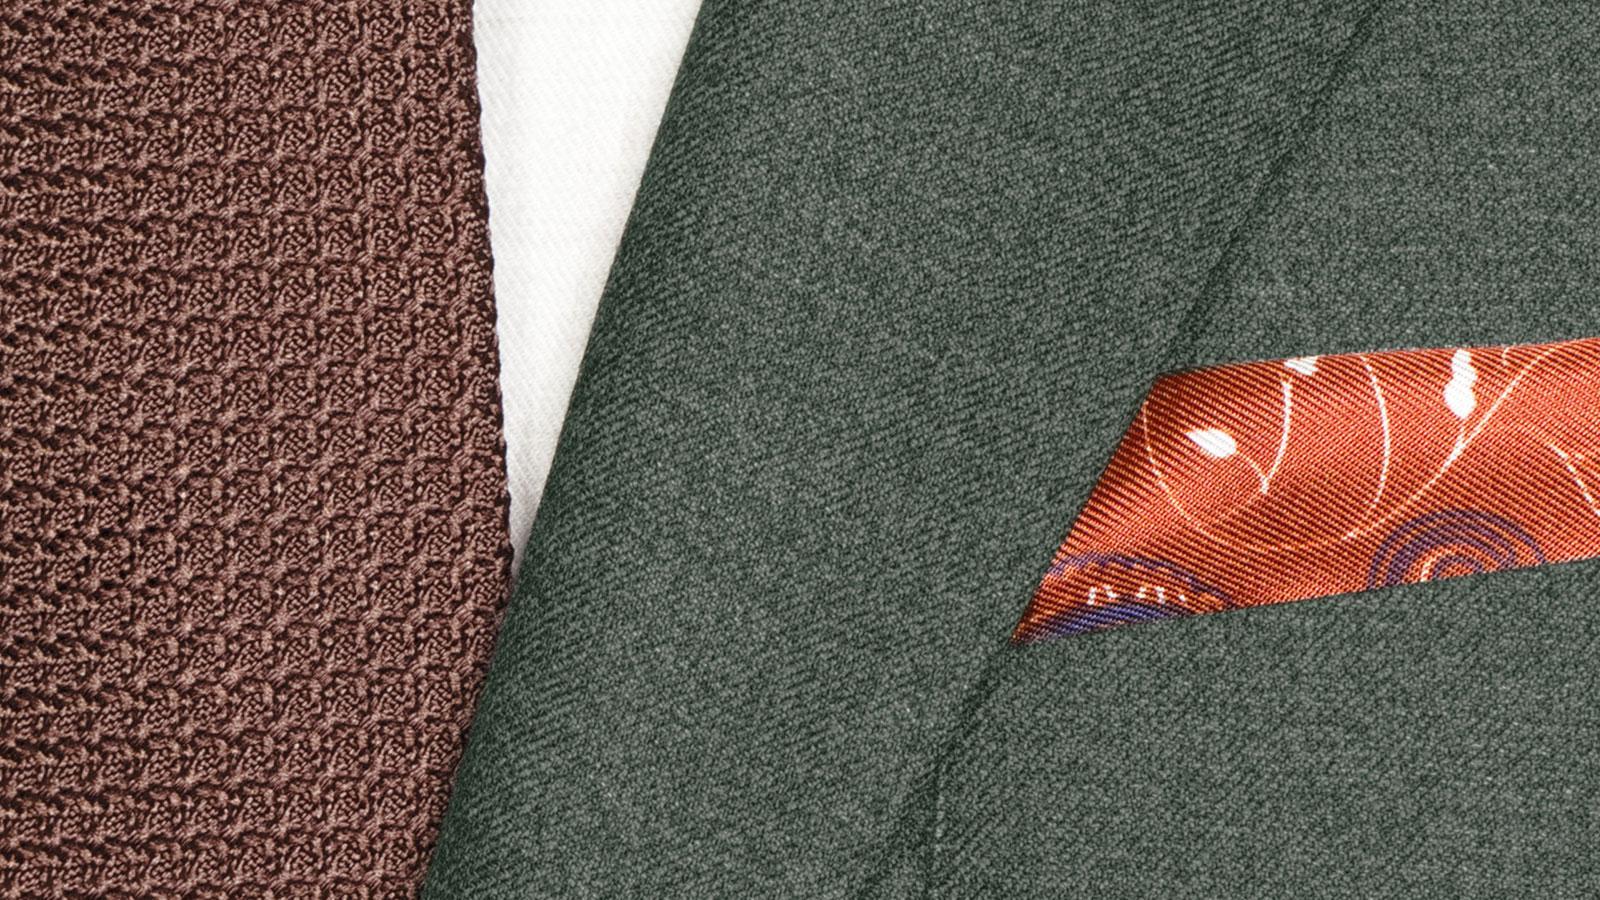 Worsted Chine Dark Green Suit - slider image 1